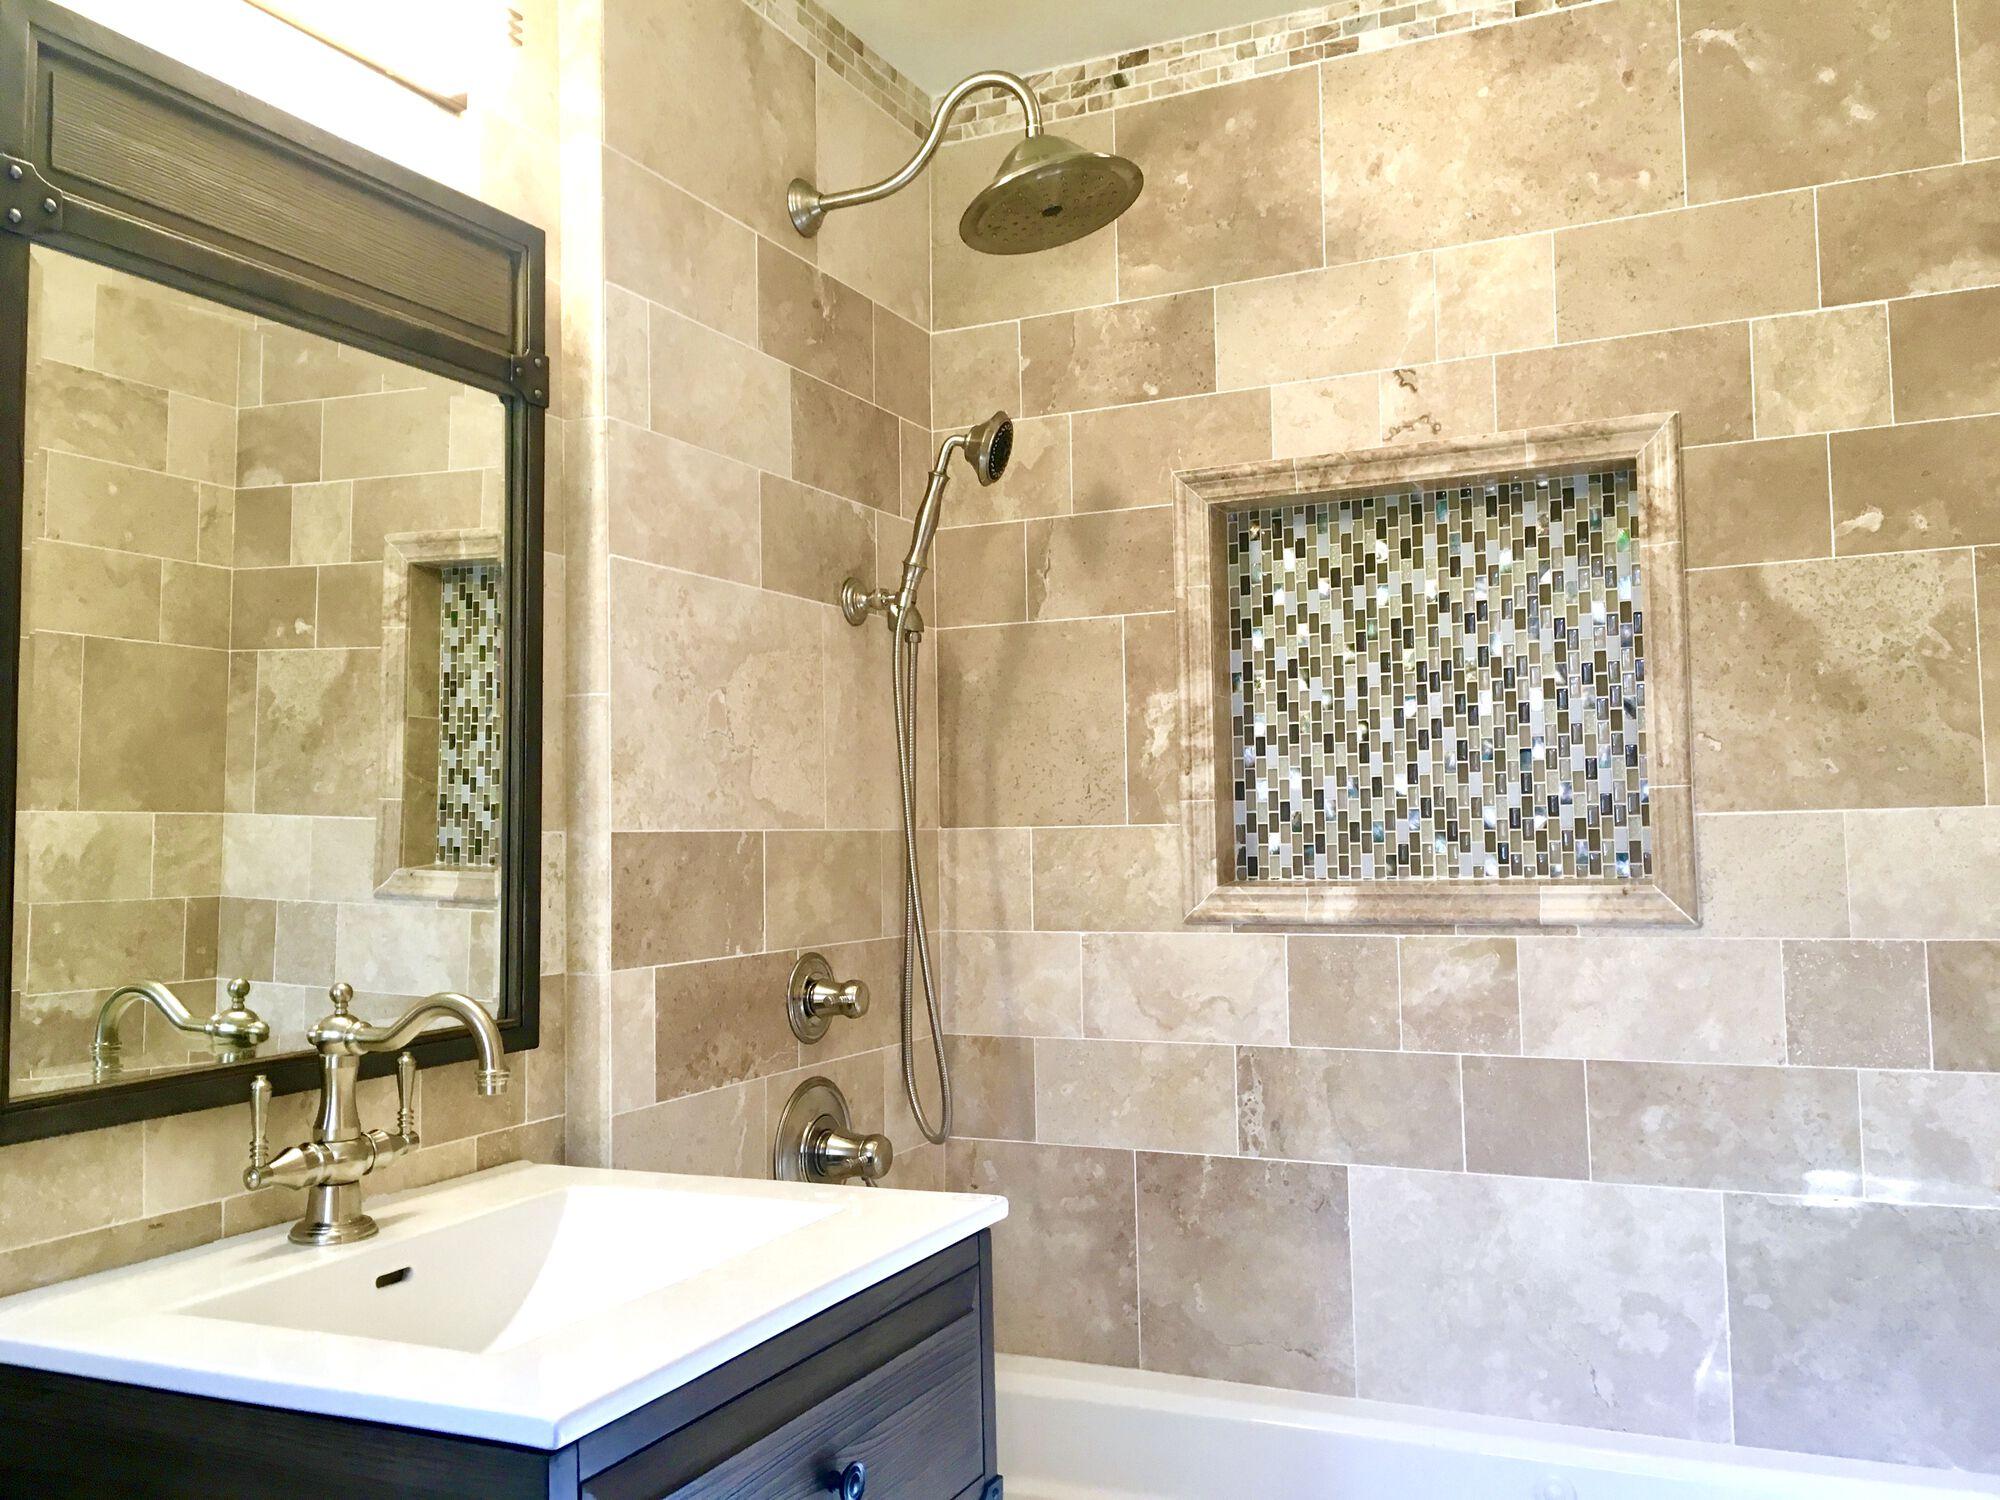 Short Hills Bath with Porcelain and Glass Tile, Kohler Fixtures in Satin Nickel Finish